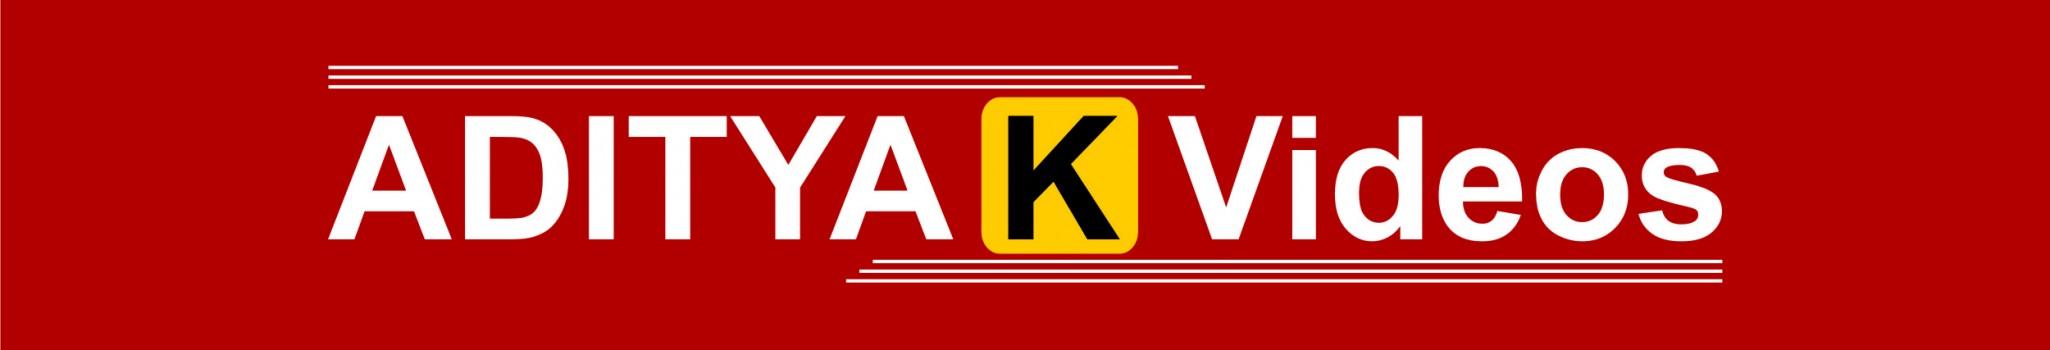 ADITYA K Videos